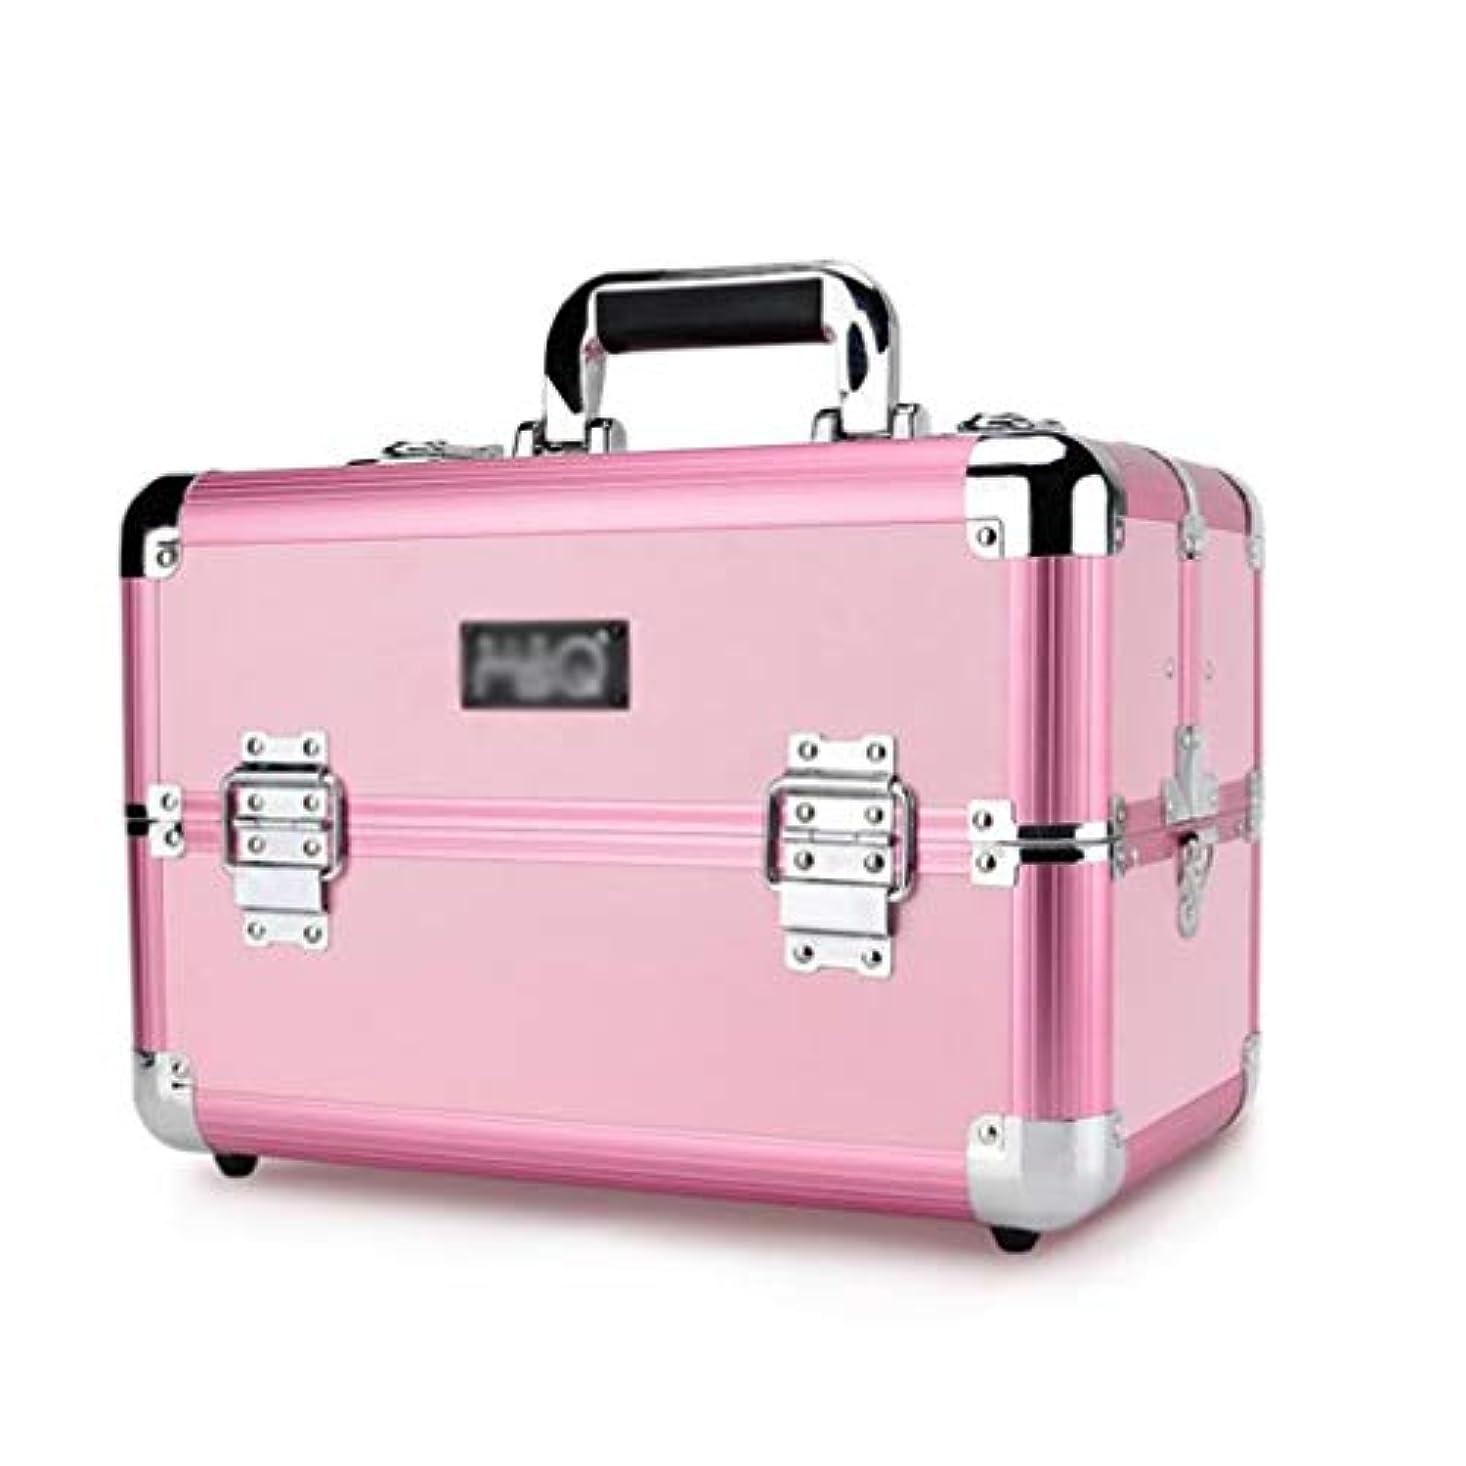 BUMC プロのアルミ化粧品ケースメイクアップトロリー列車テーブル虚栄心のための美容師特大旅行ジュエリーボックスオーガナイザー,Pink